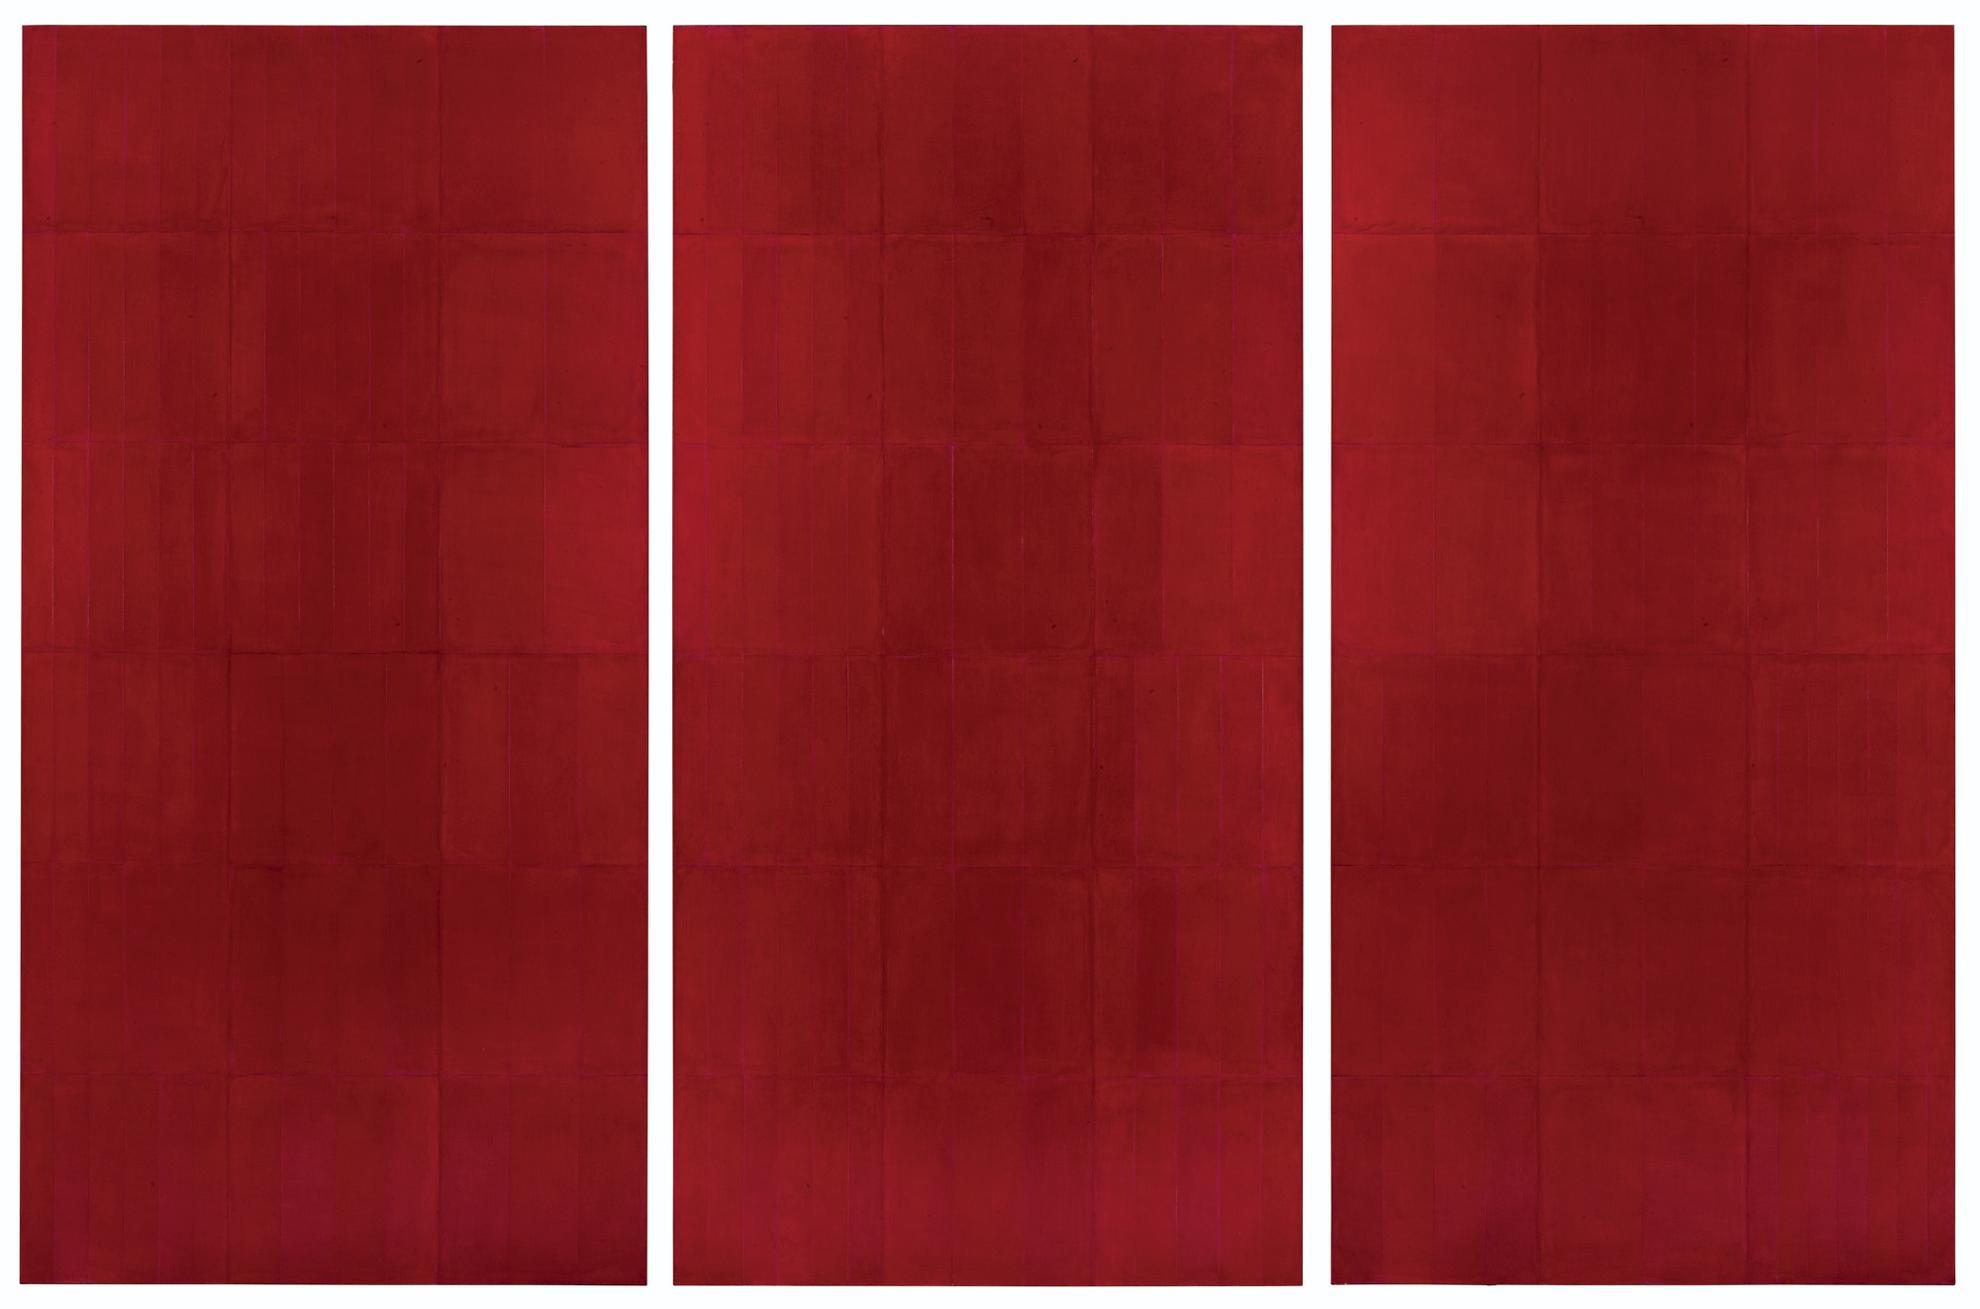 Gottfried Honegger-Tableau Relief P 758-1976